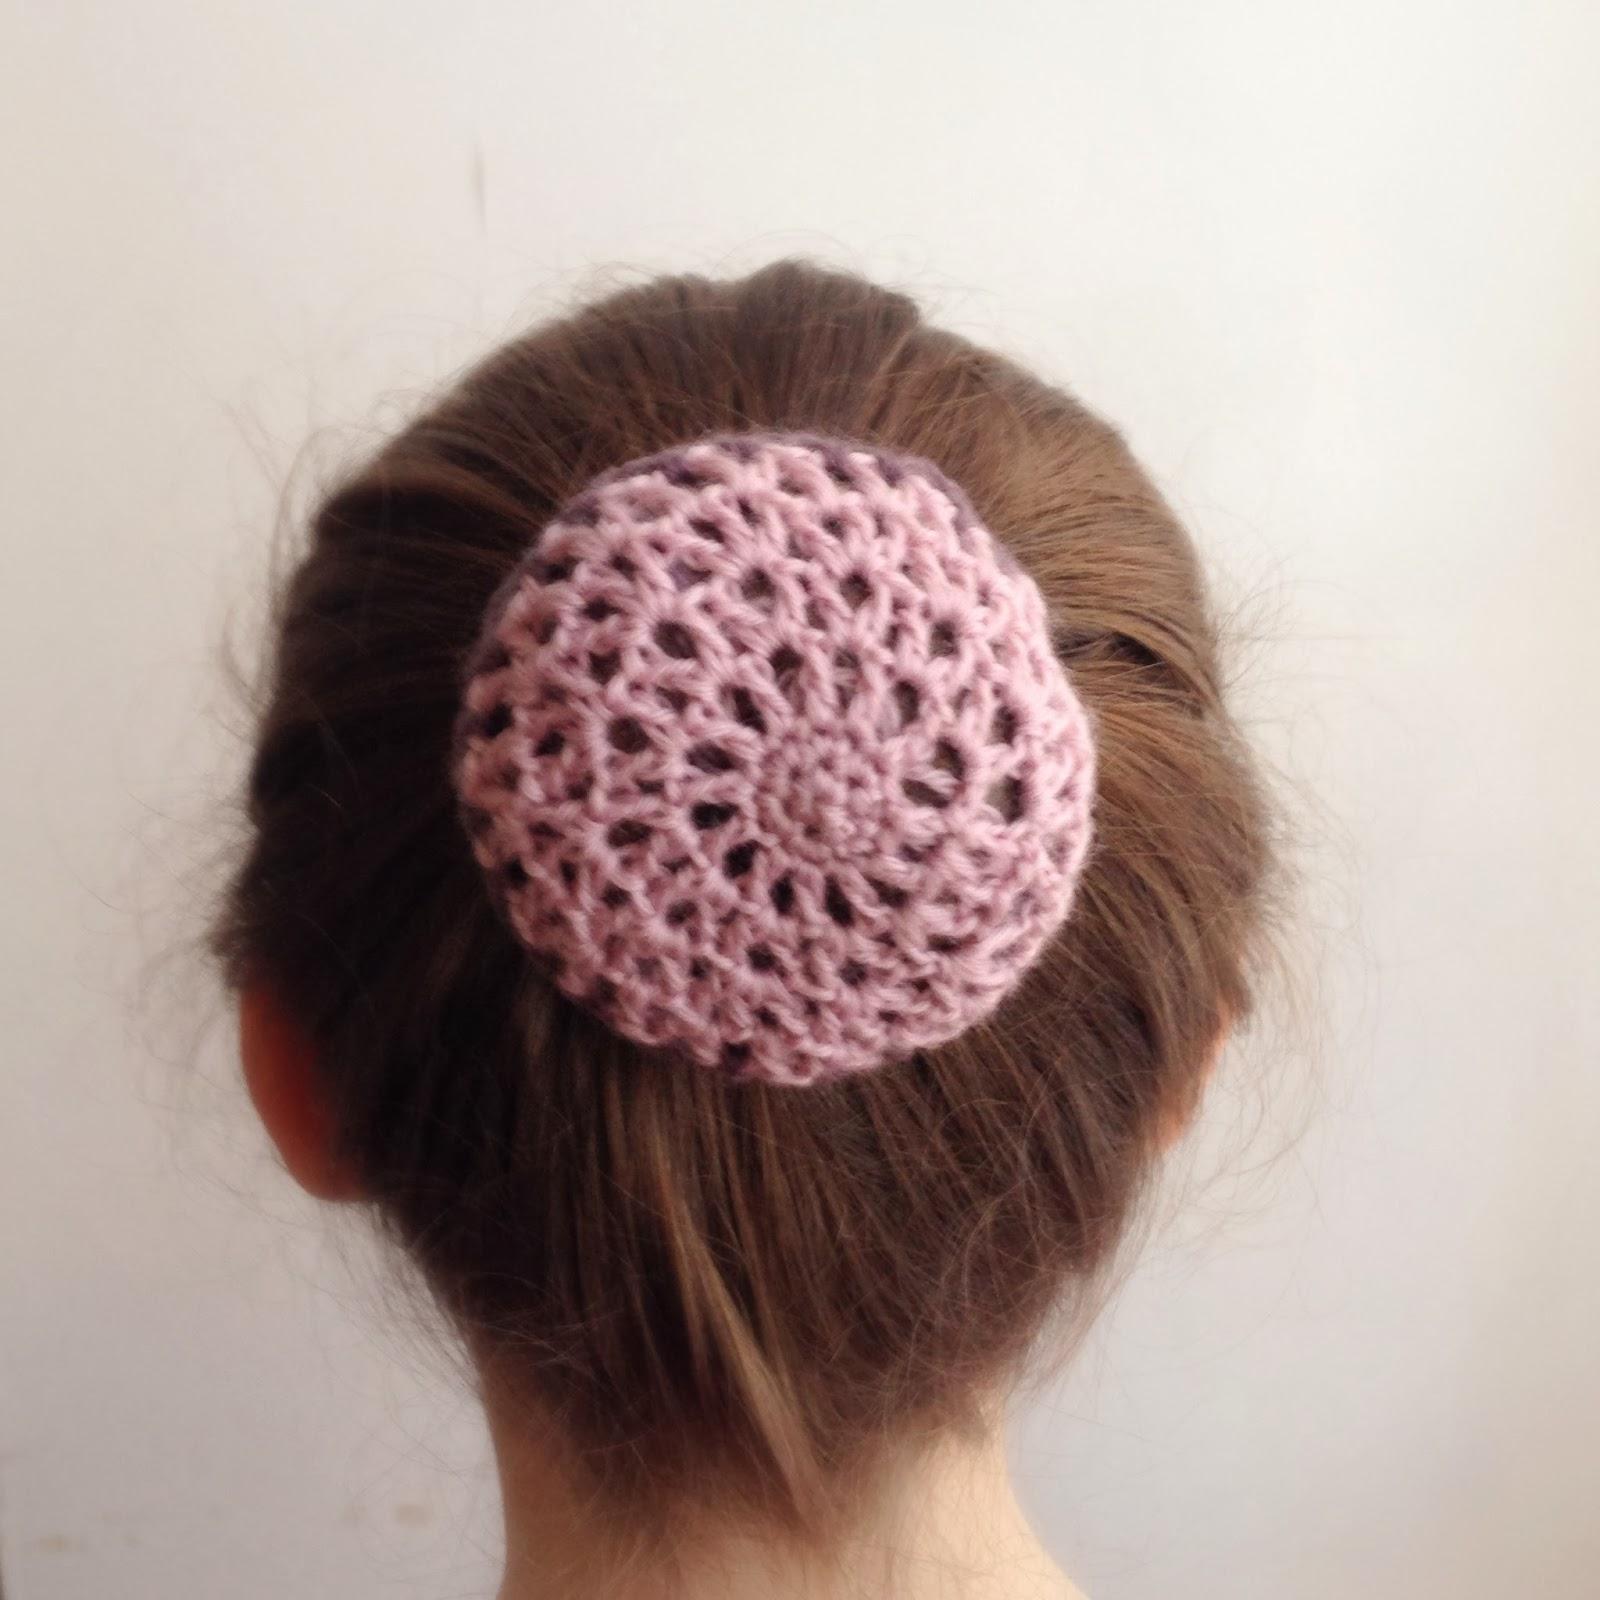 Crochet bun cover © L'Anglaise